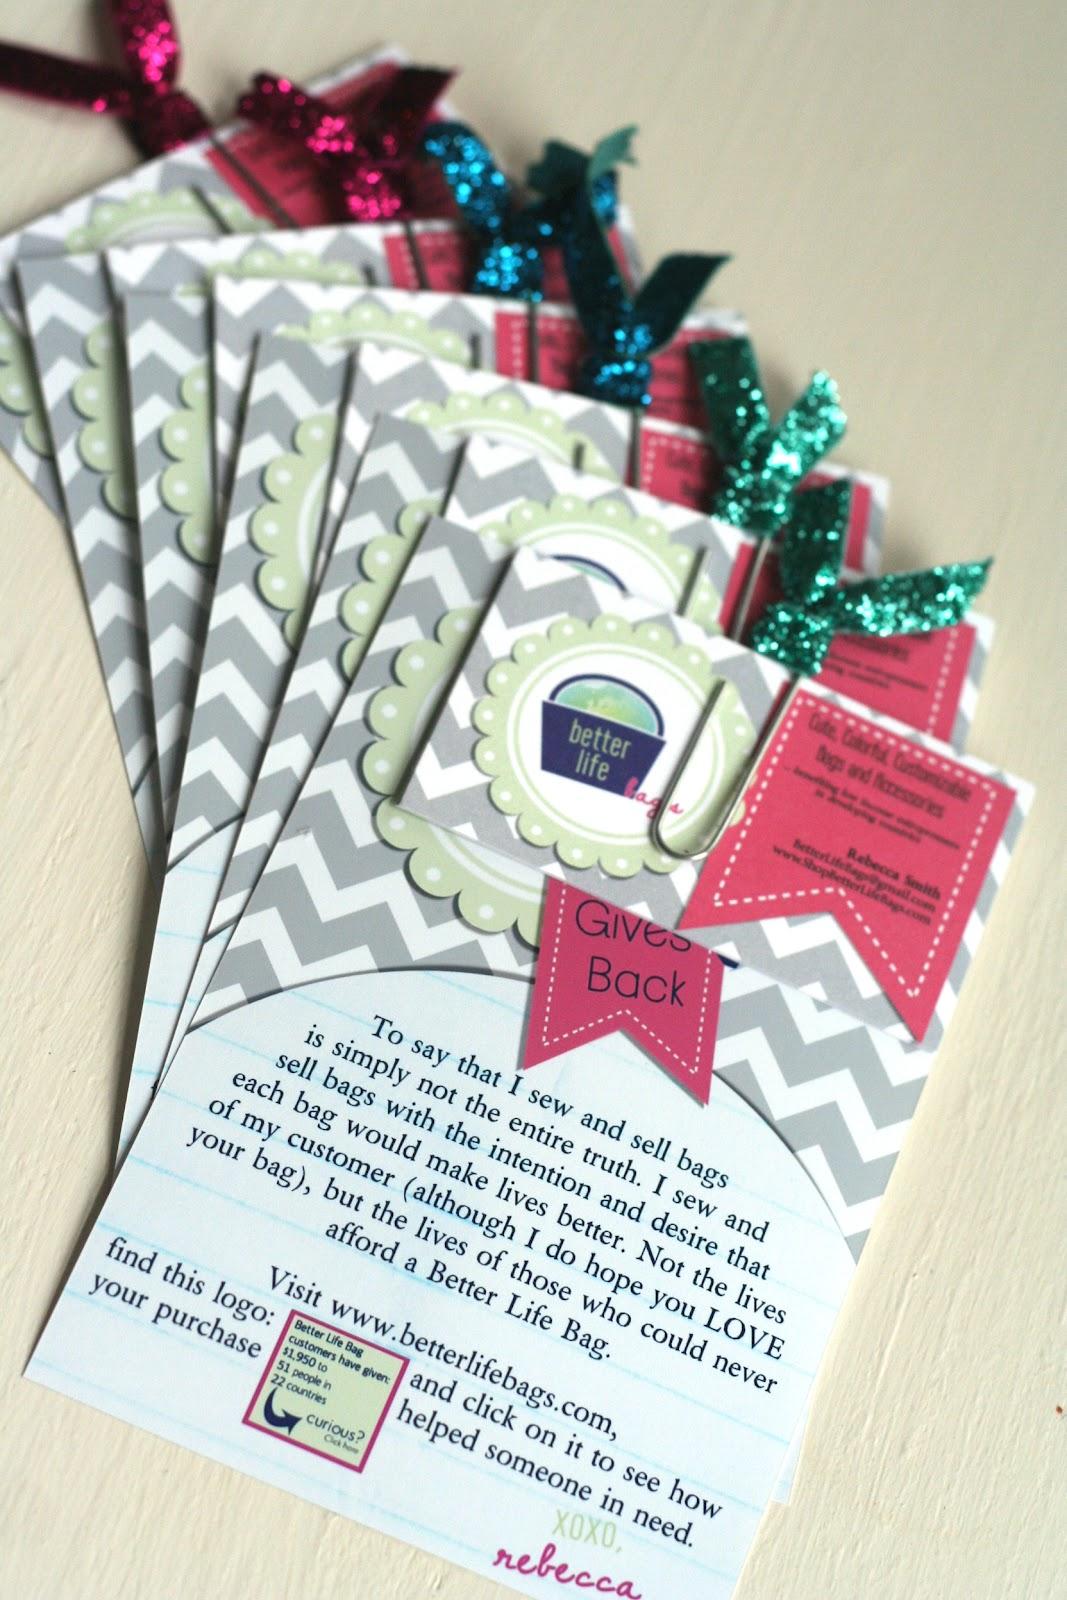 Better Life Blog: Custom Business Cards from Vistaprint